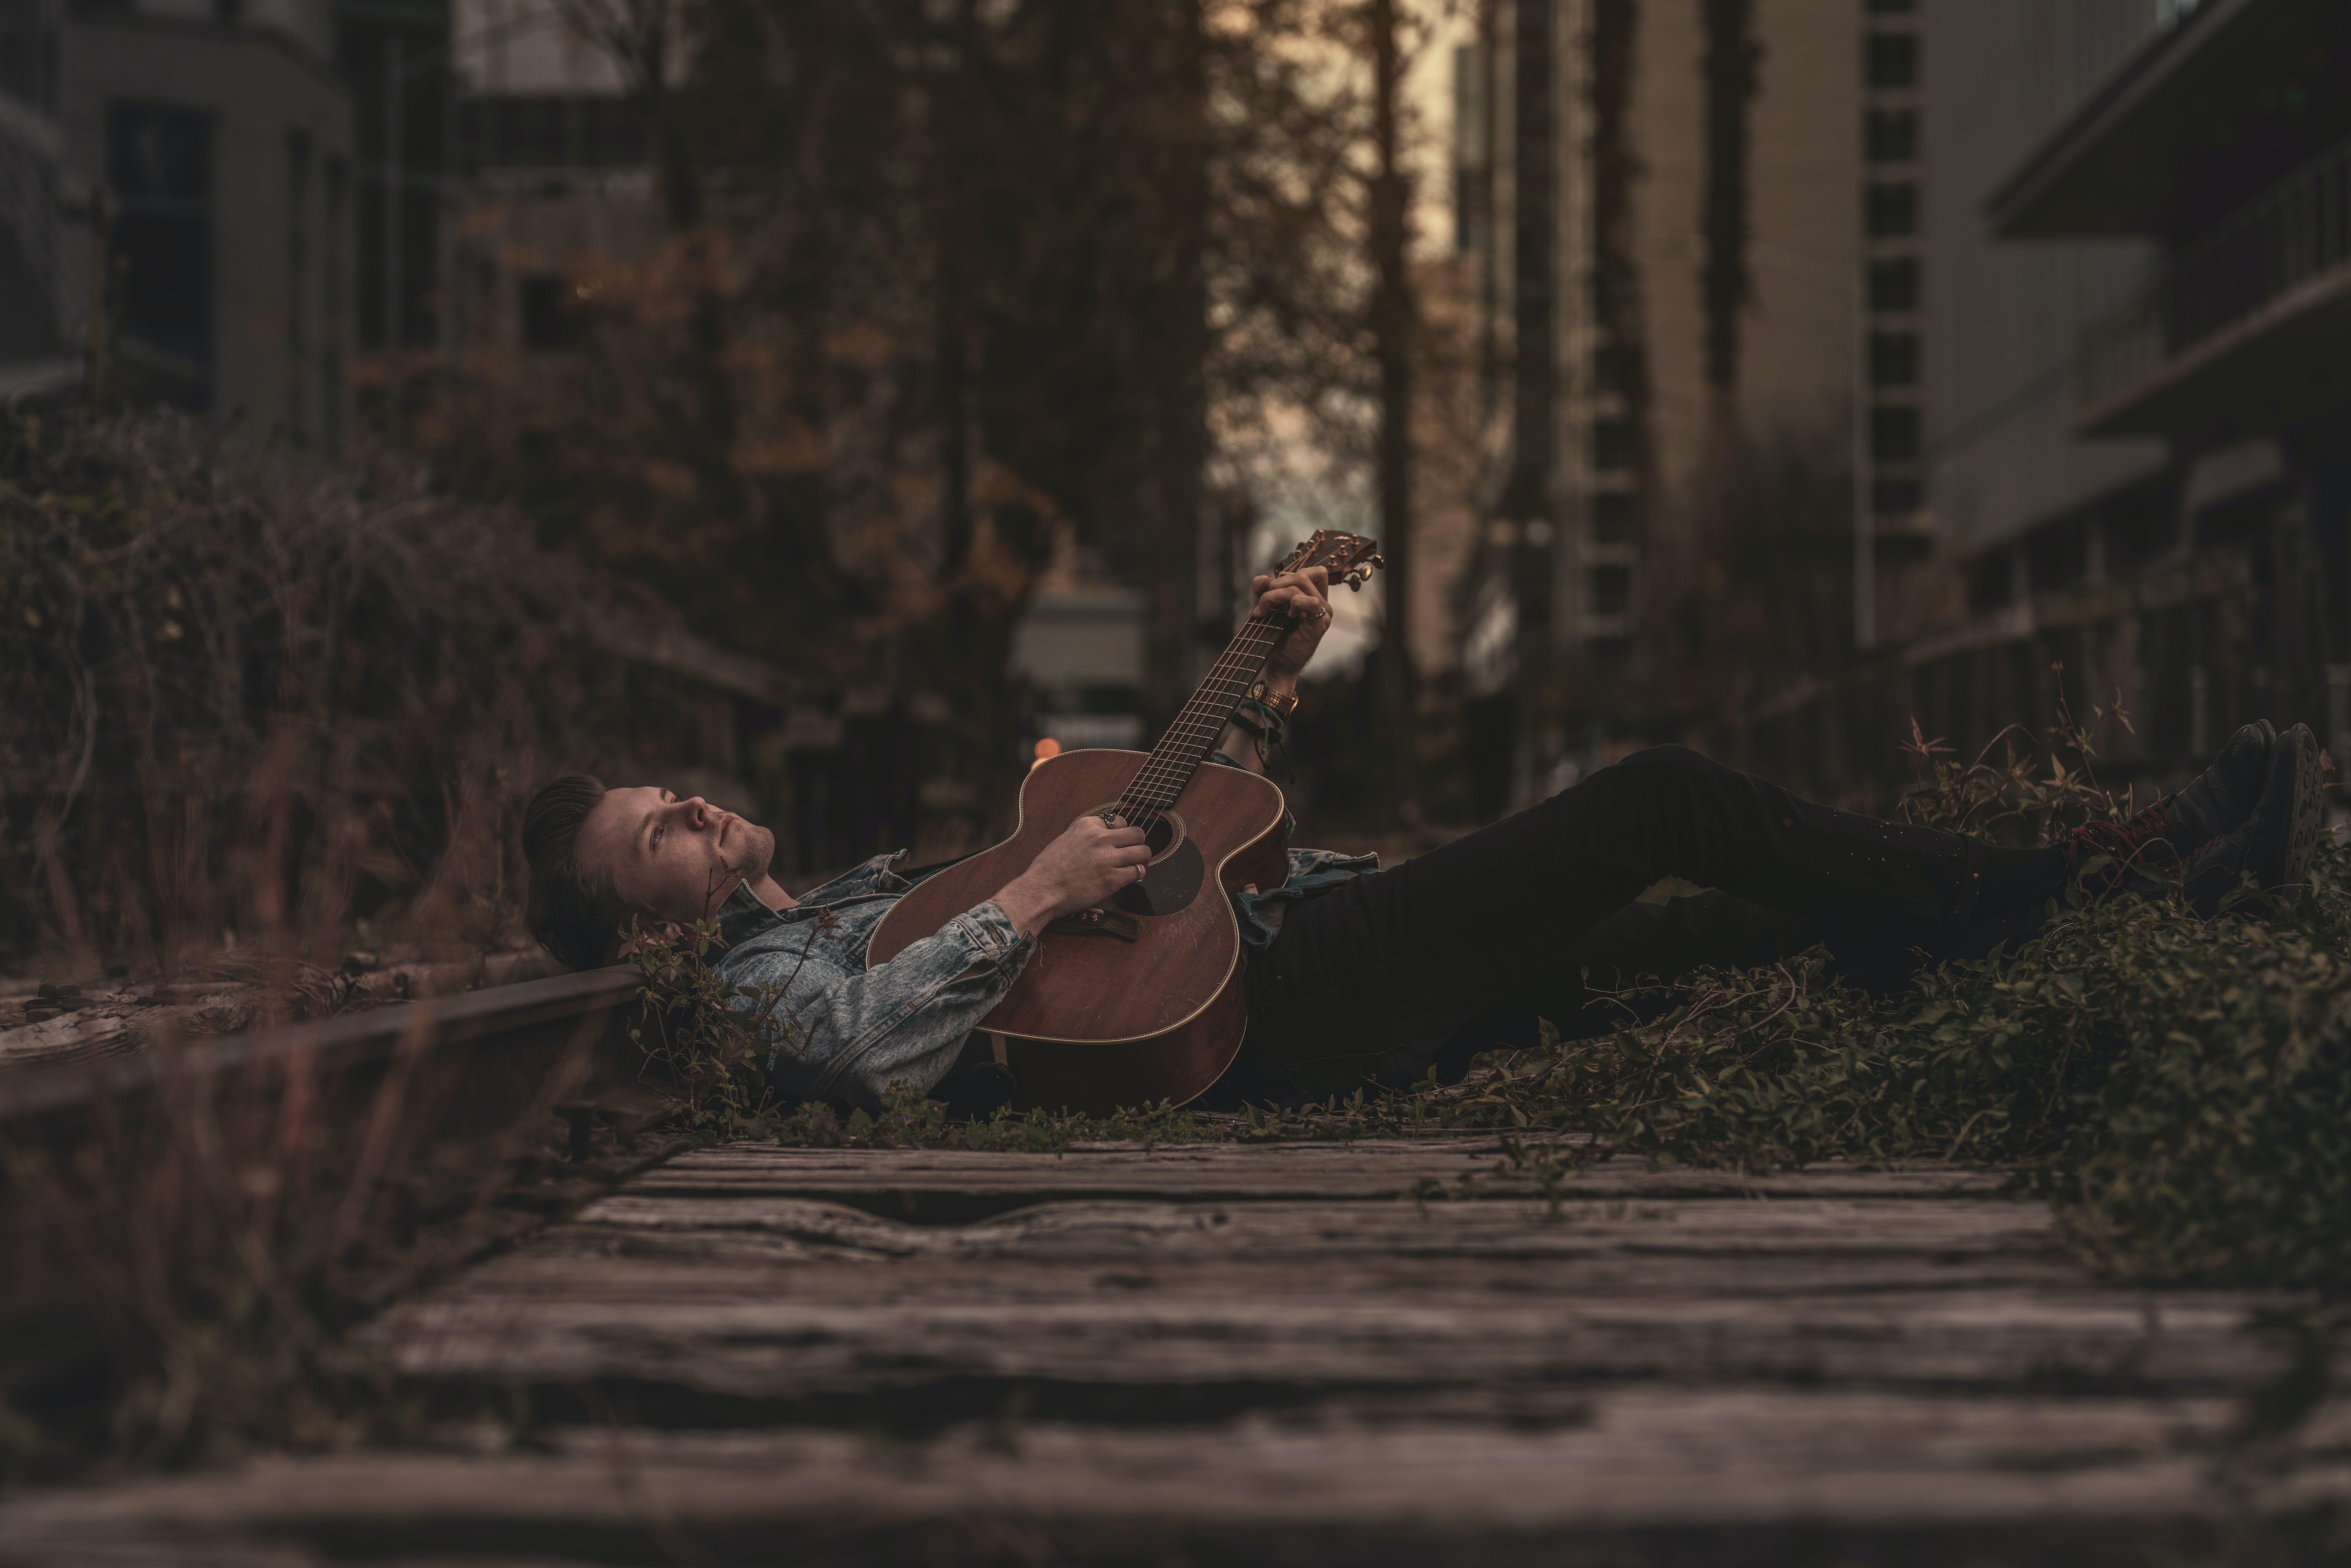 Kostenloses Stock Foto zu dressman, erholung, gitarre, gitarrist